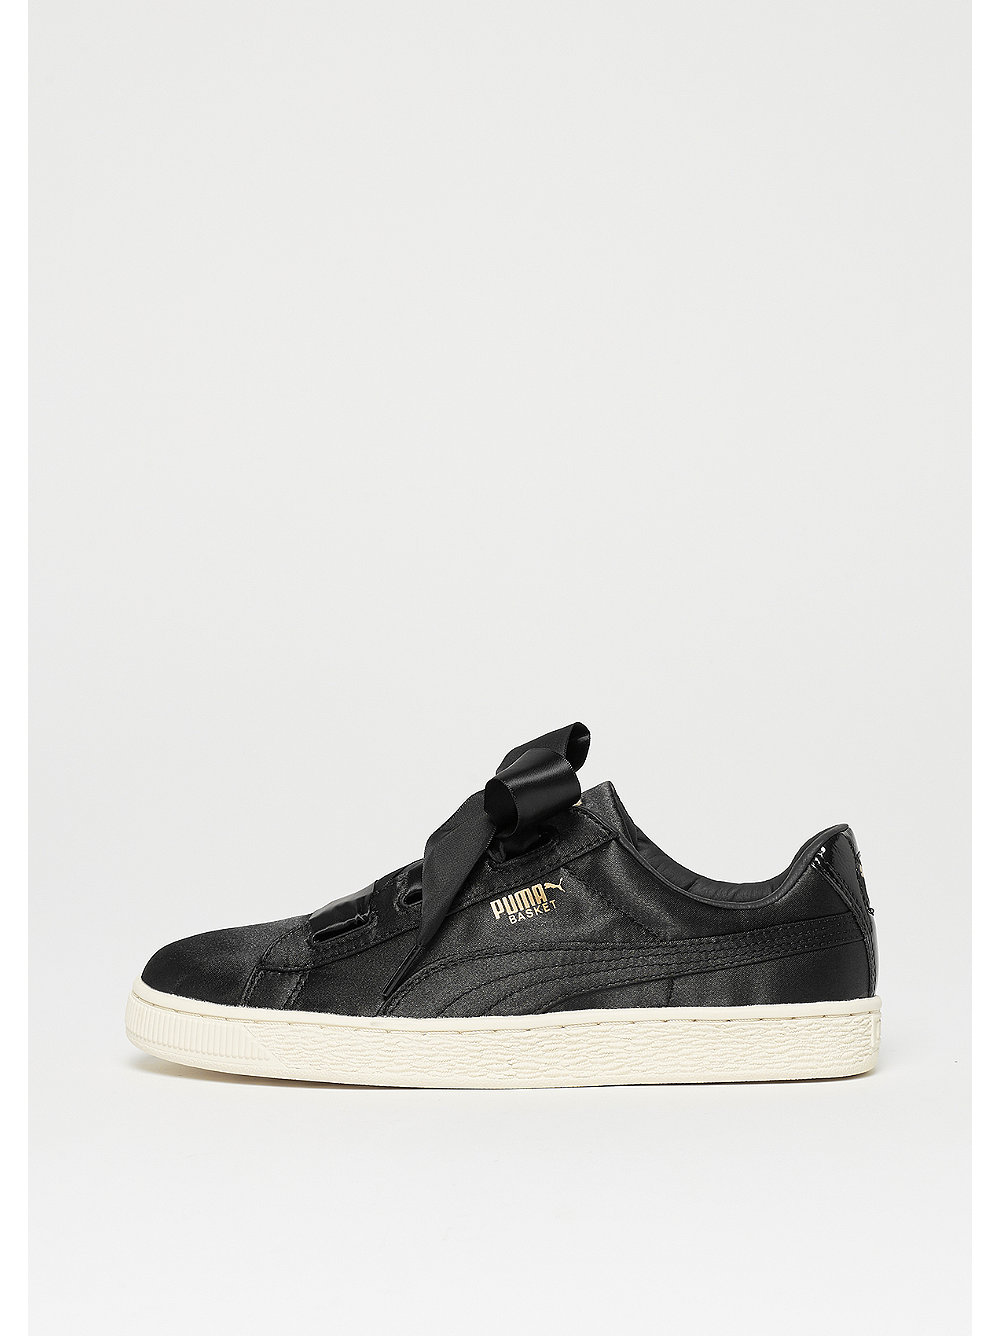 basket heart tween black sneaker von puma bei snipes. Black Bedroom Furniture Sets. Home Design Ideas